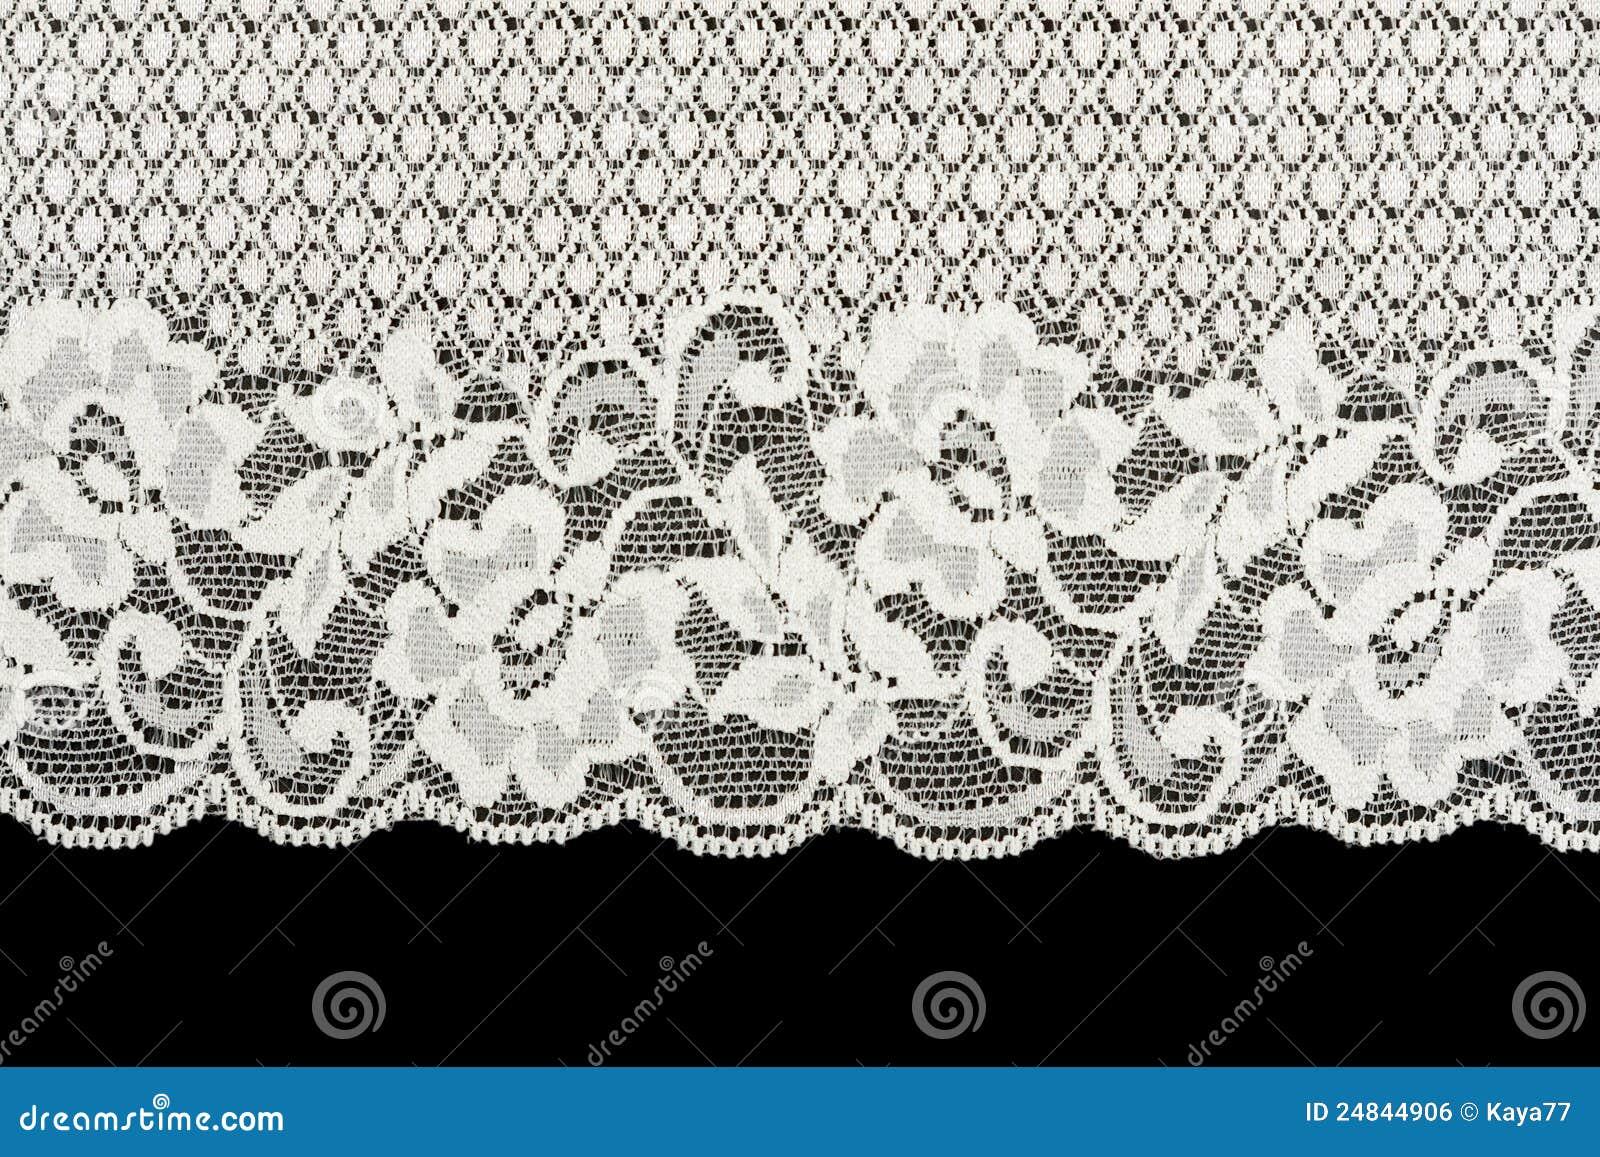 Patterned White Lace On Black Background Stock Photo ...